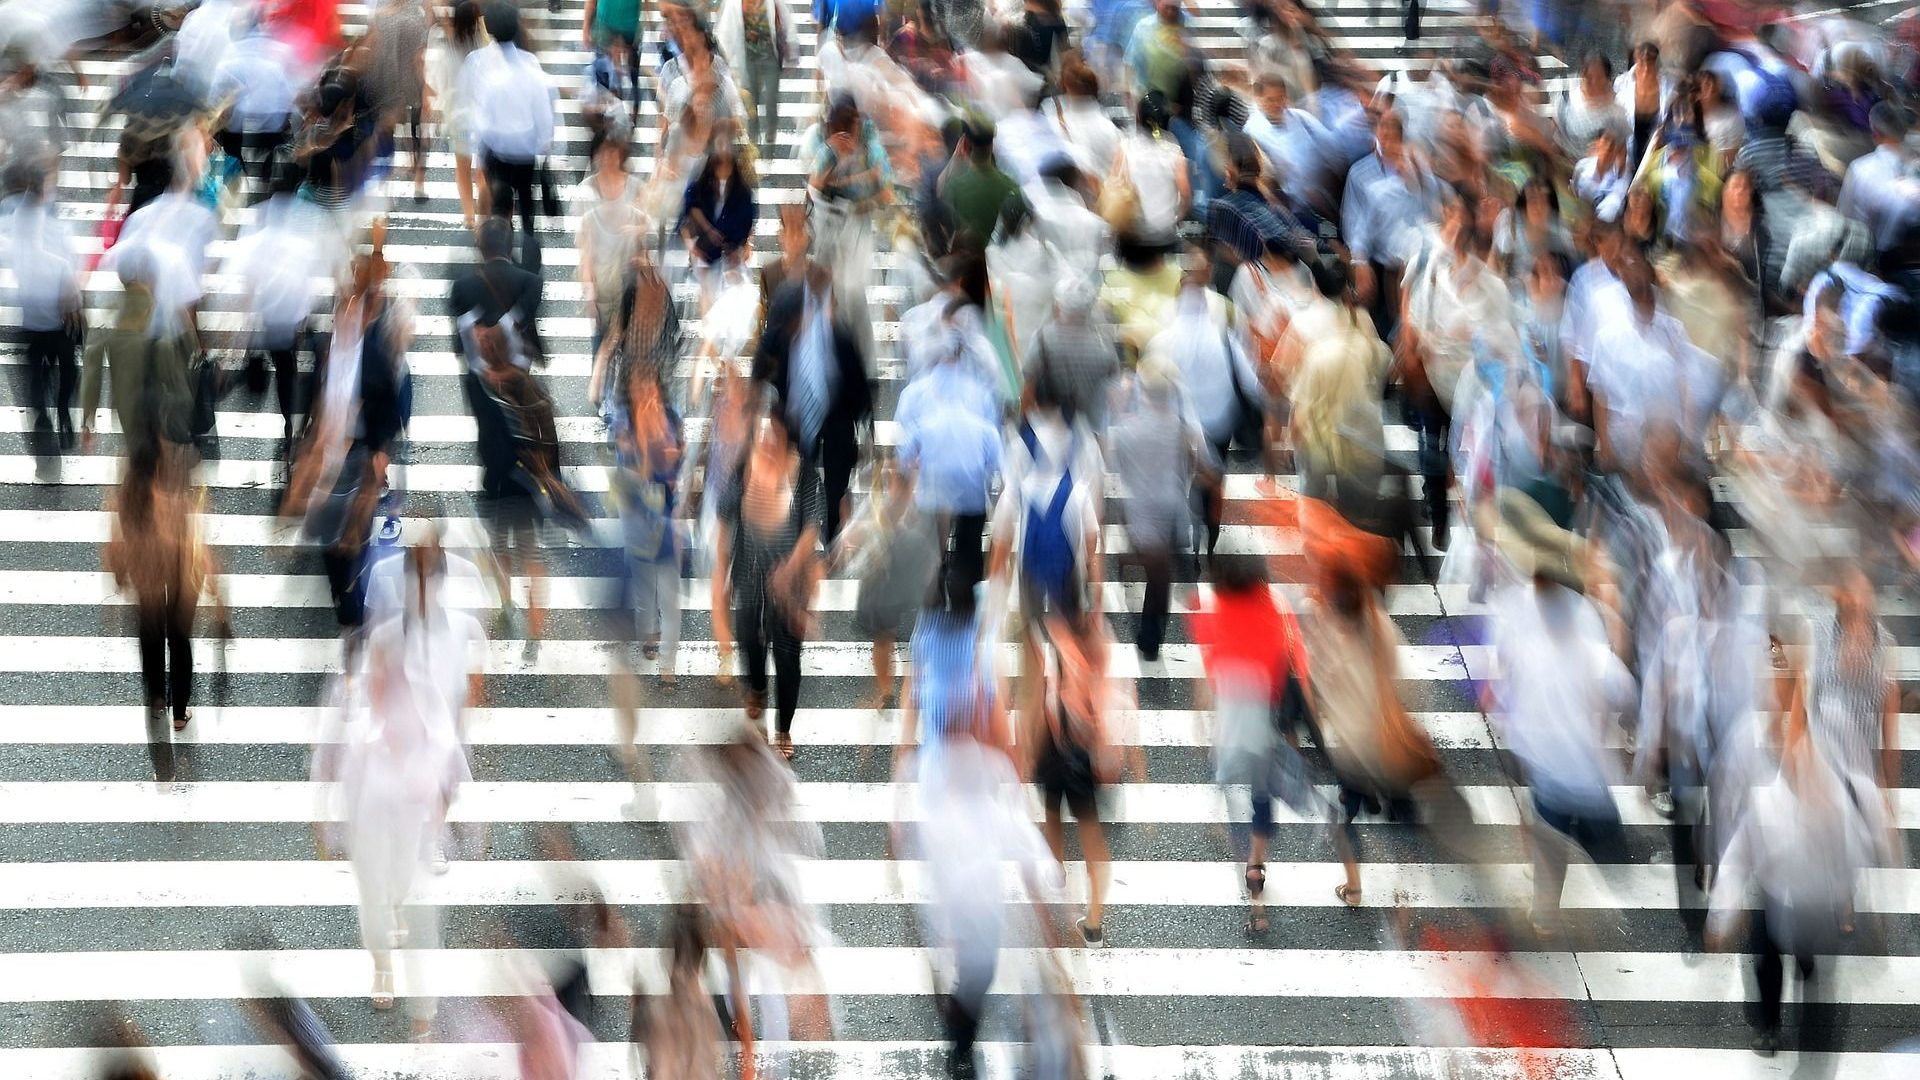 Pedestrians on city crossing